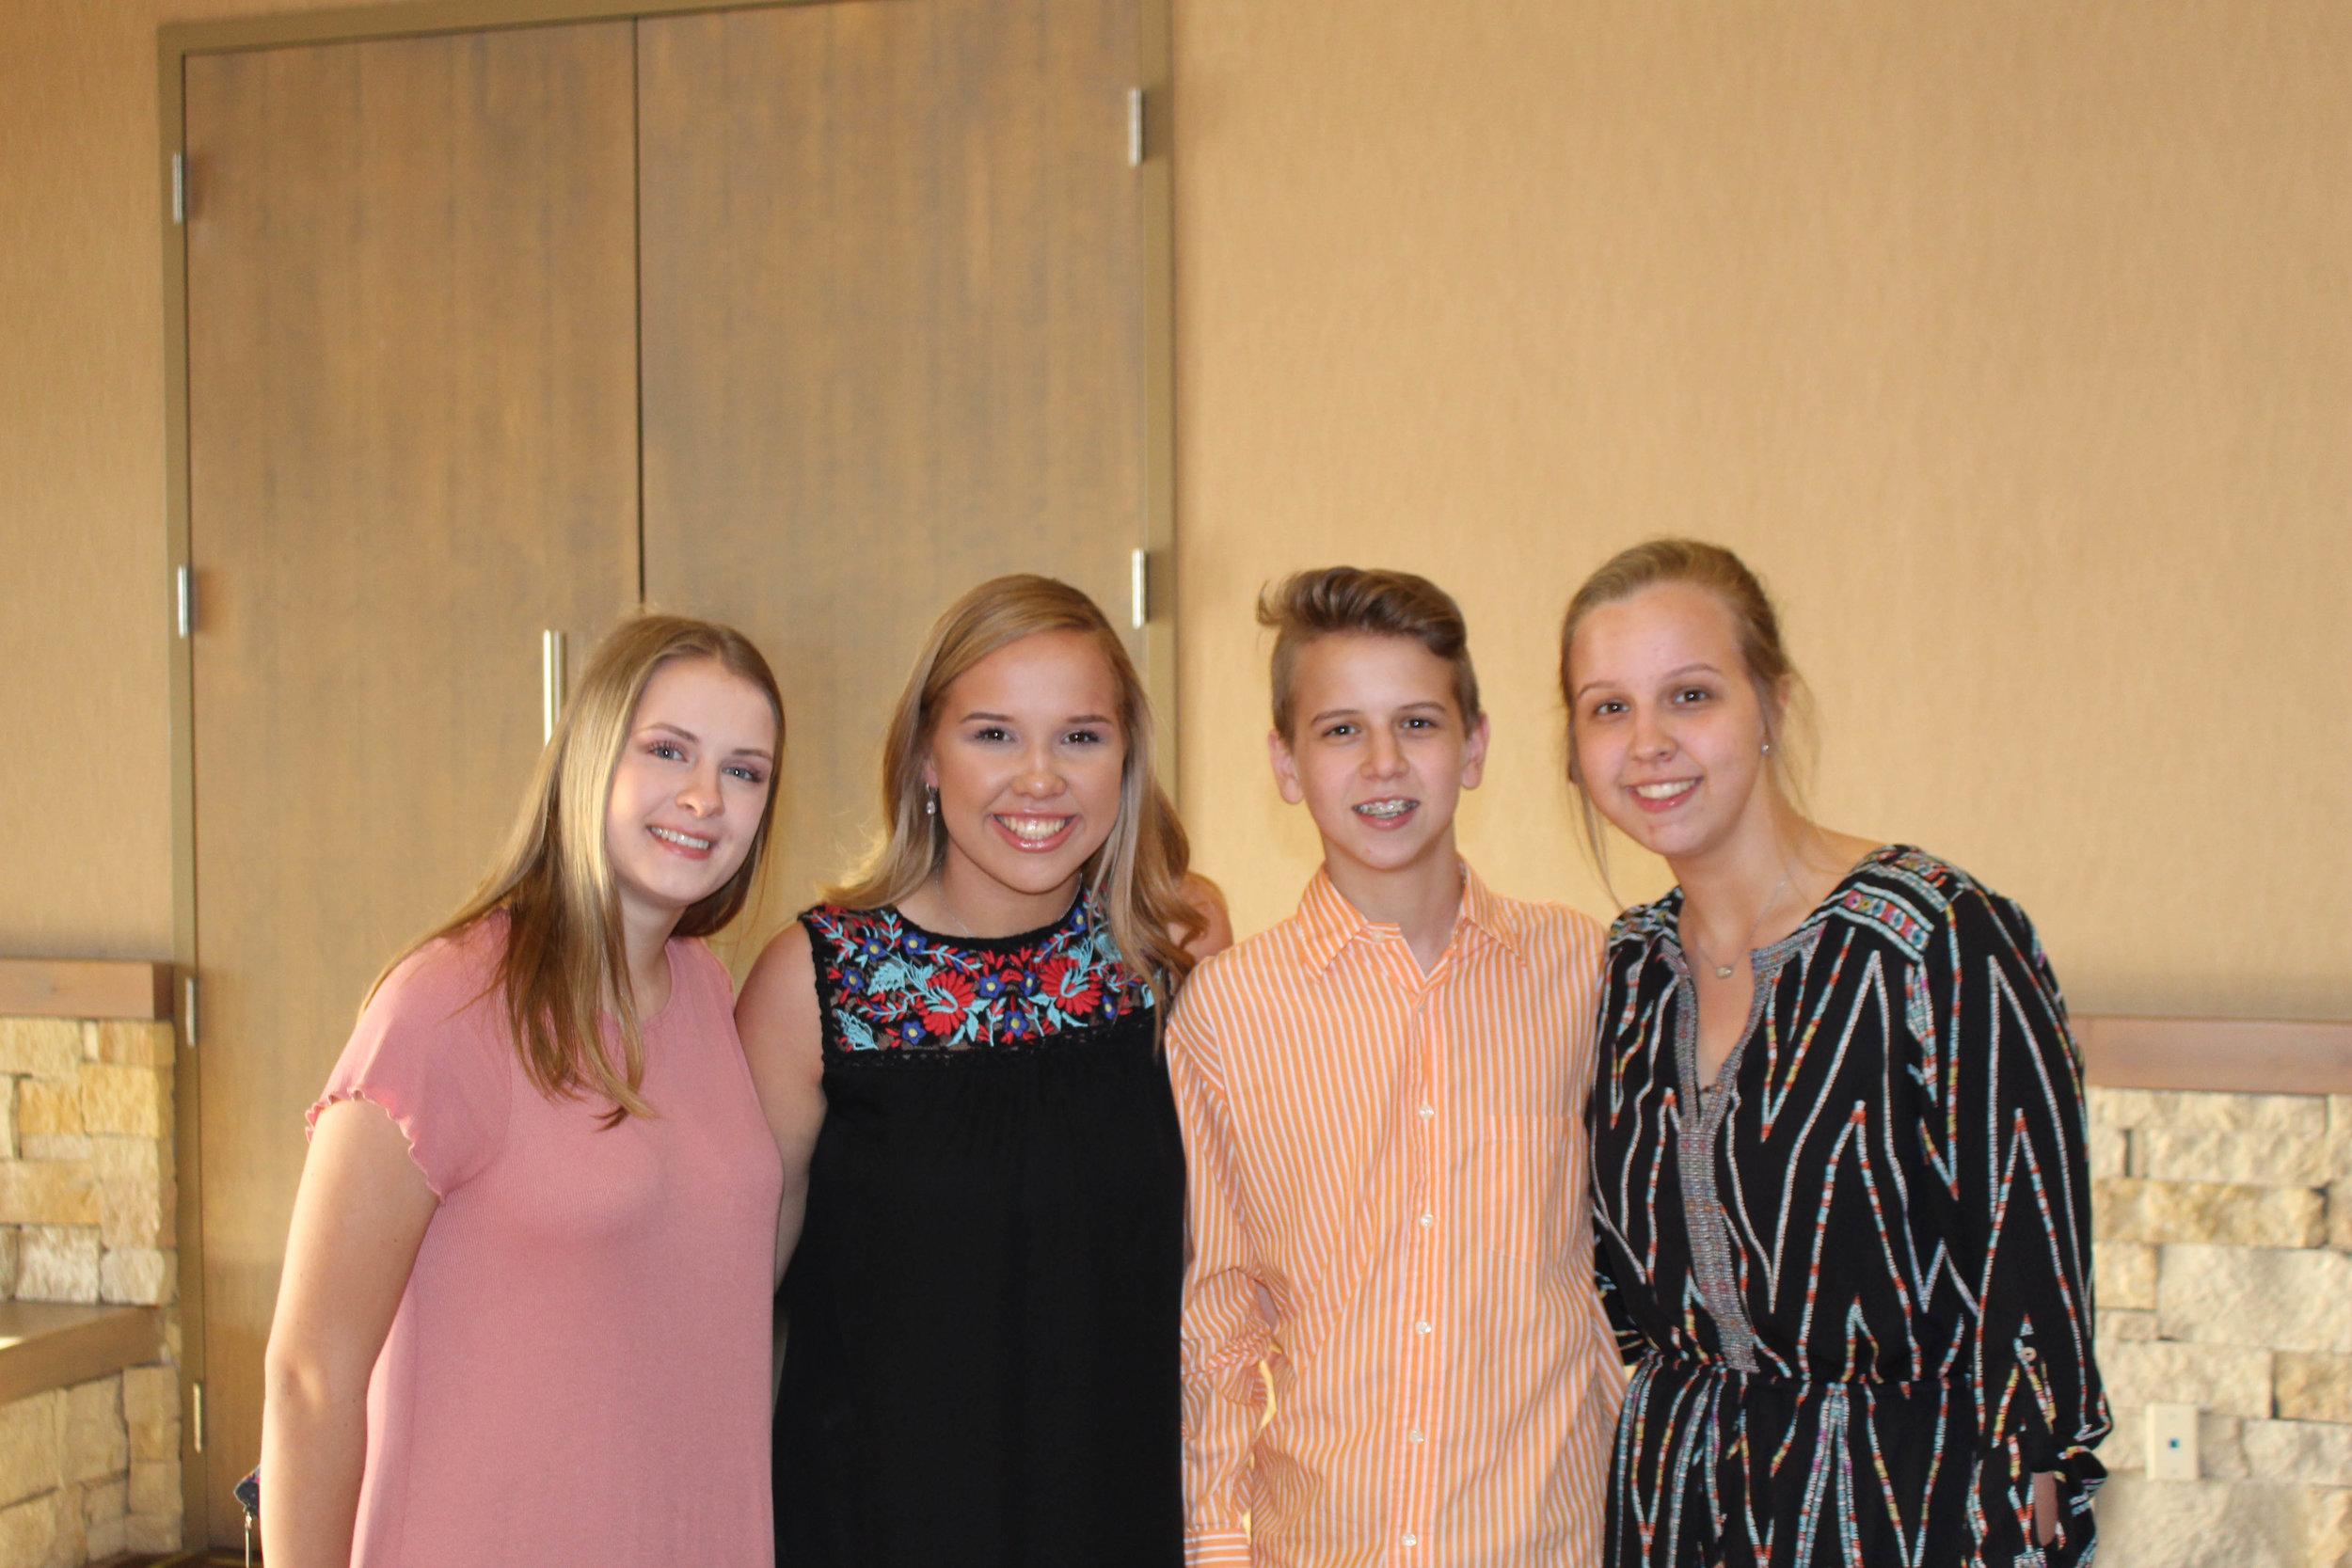 Annika Richter, Bailey Hall, Trace Hall and Madison Hall